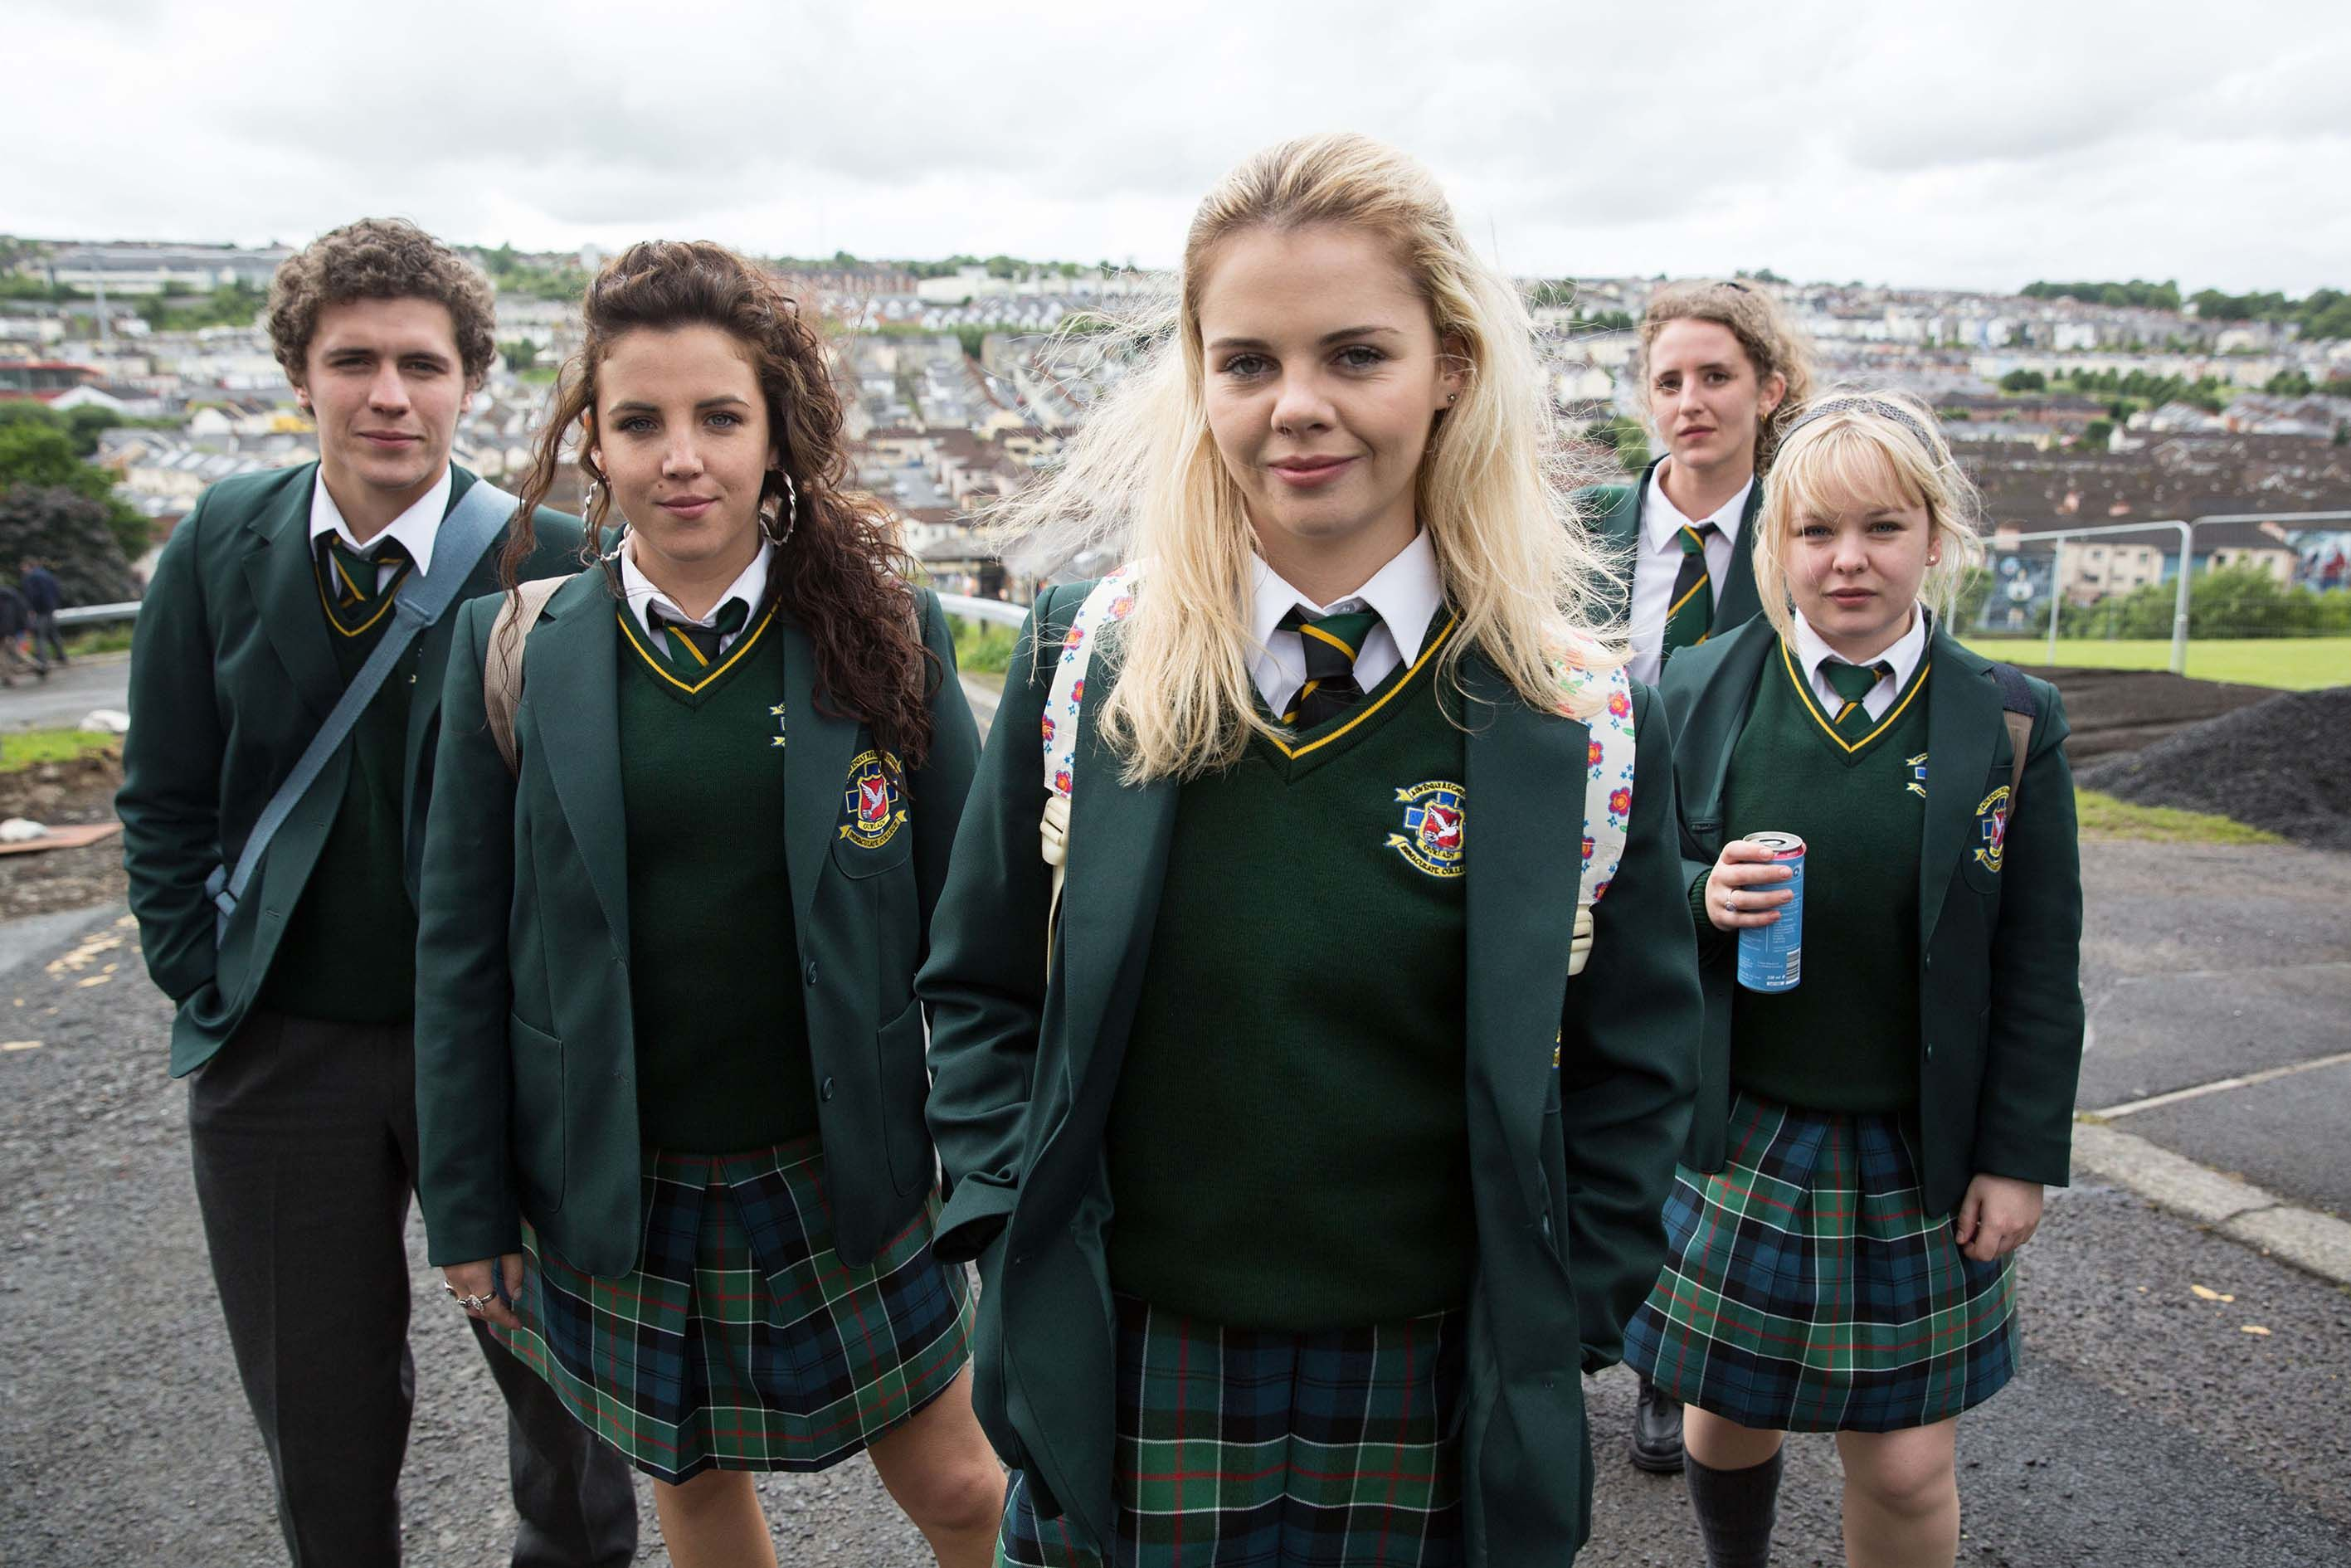 l-r: James Maguire (Dylan Llewellyn), Michelle Mallon (Jamie-Lee O'Donnell), Erin Quinn (Saoirse Jackson), Orla McCool (Louisa Harland), Clare Devlin (NIcola Coughlan),